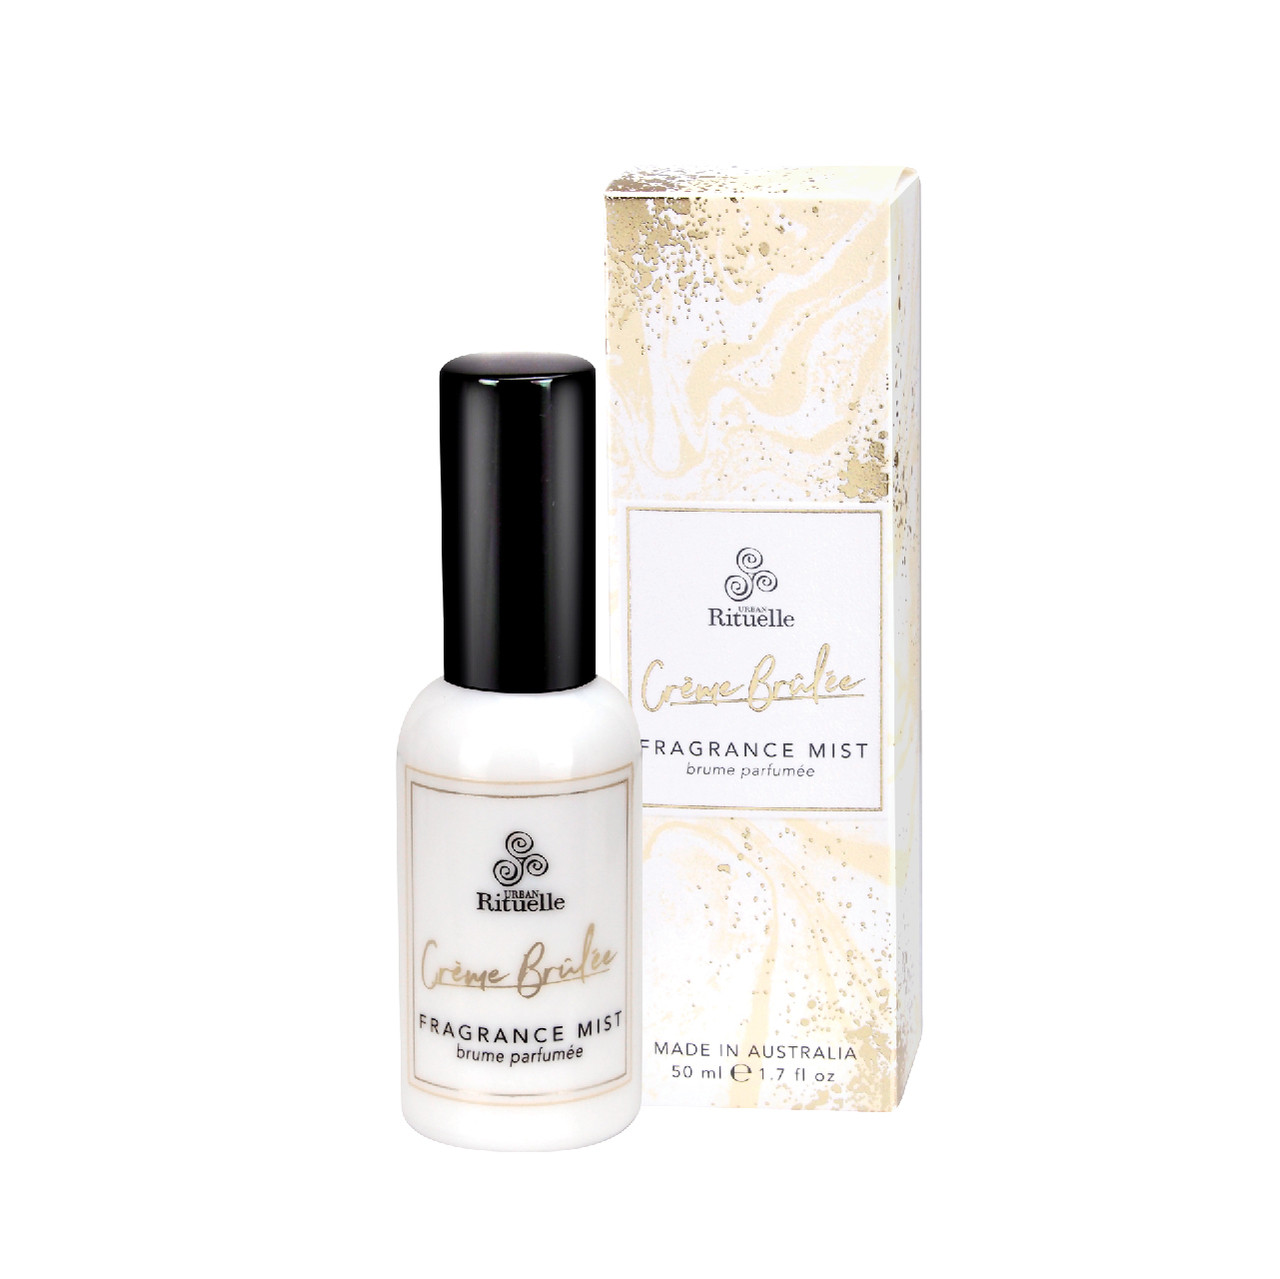 Sweet Treats - Creme Brulee - Fragrance Mist - Urban Rituelle